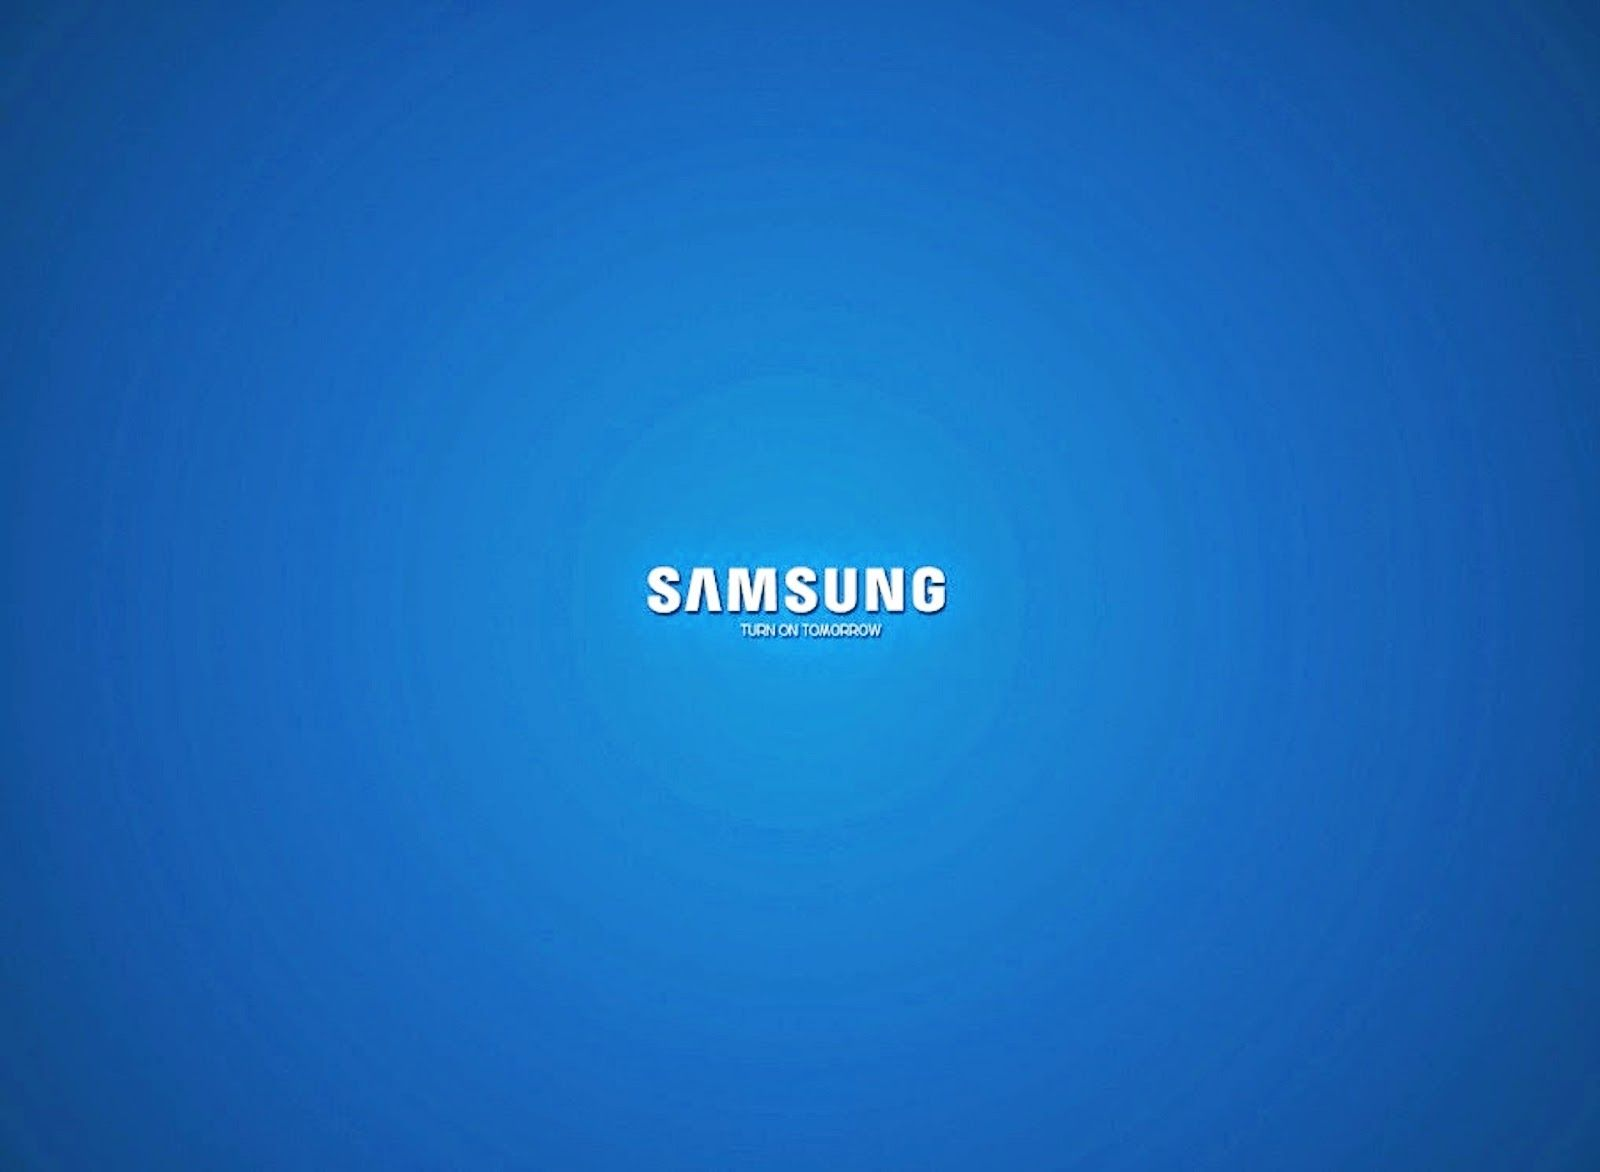 Samsung Laptop Wallpapers Top Free Samsung Laptop Backgrounds Wallpaperaccess